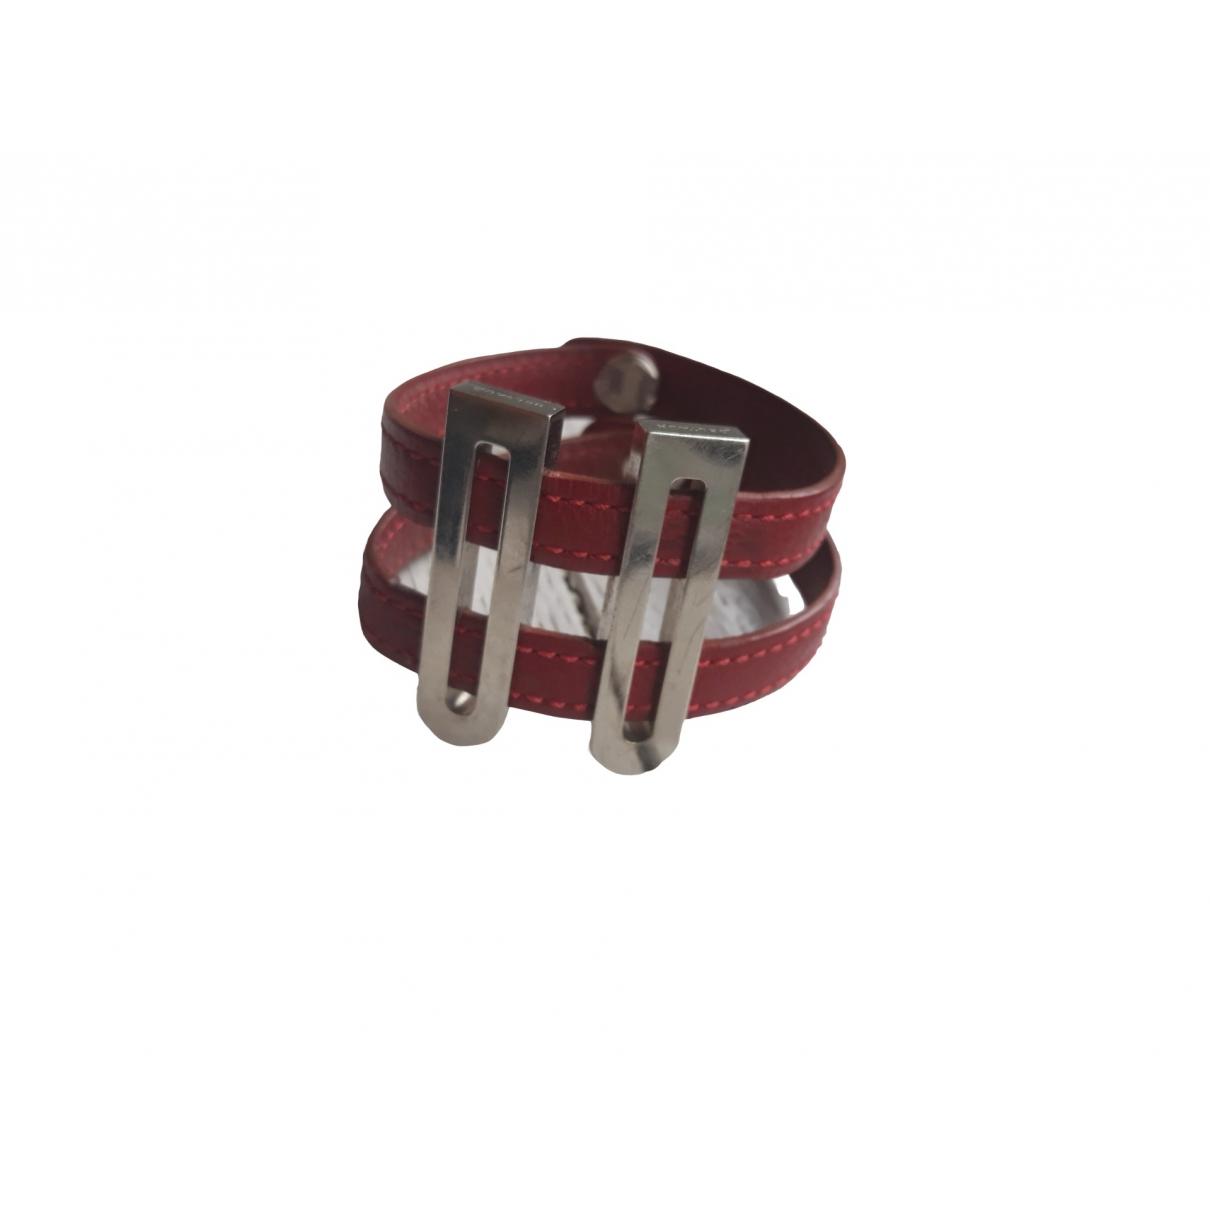 Delvaux \N Armband in  Bordeauxrot Leder